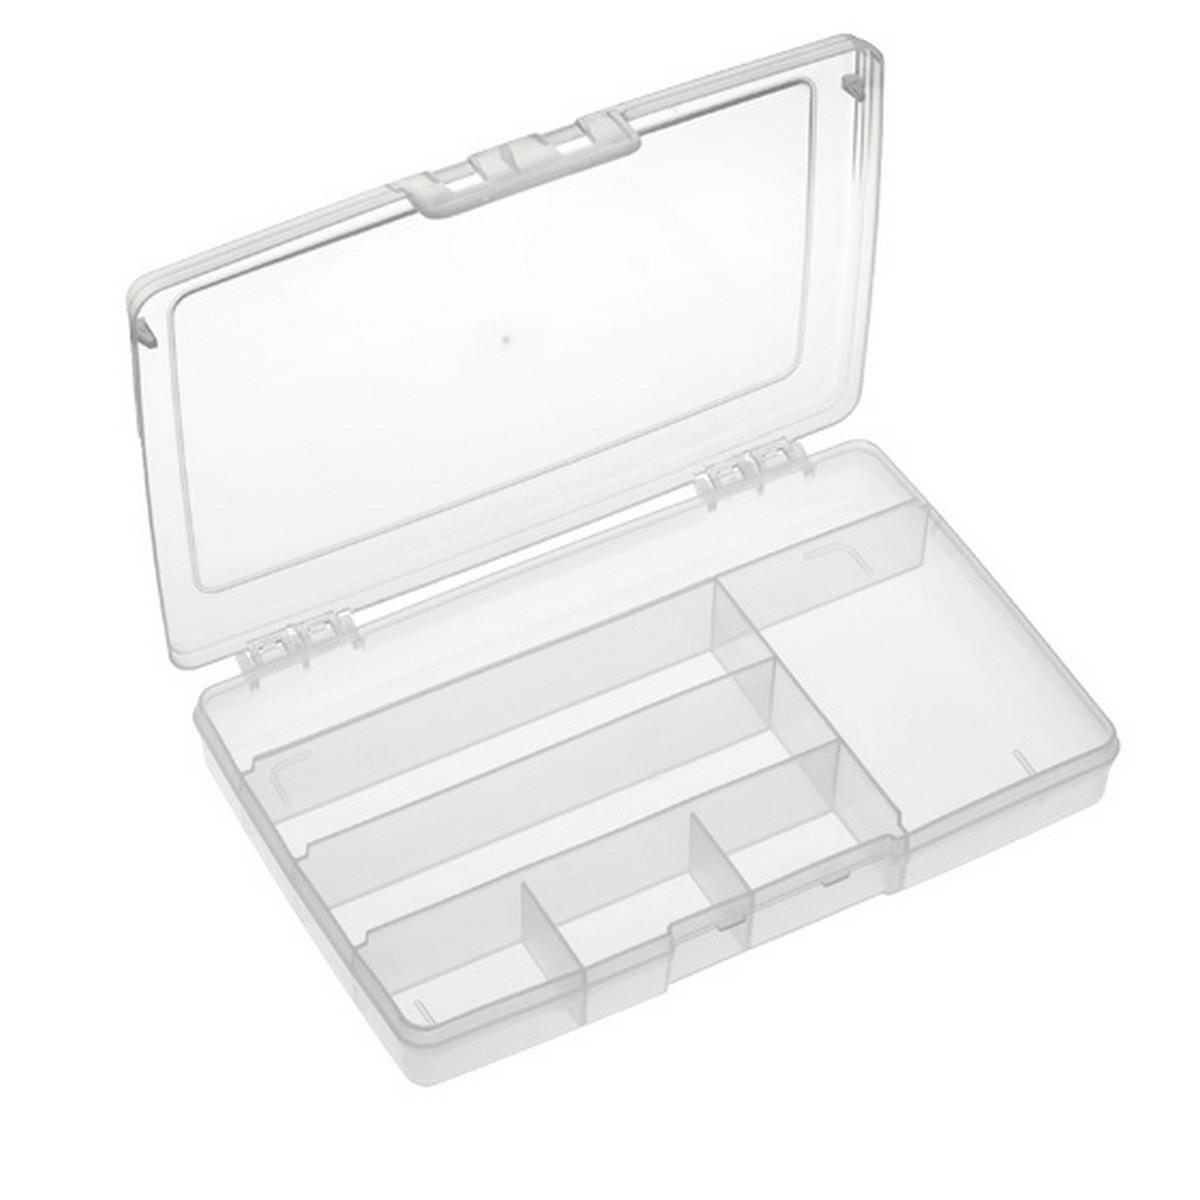 Кутия за принадлежности Plastica Panaro 191/7N